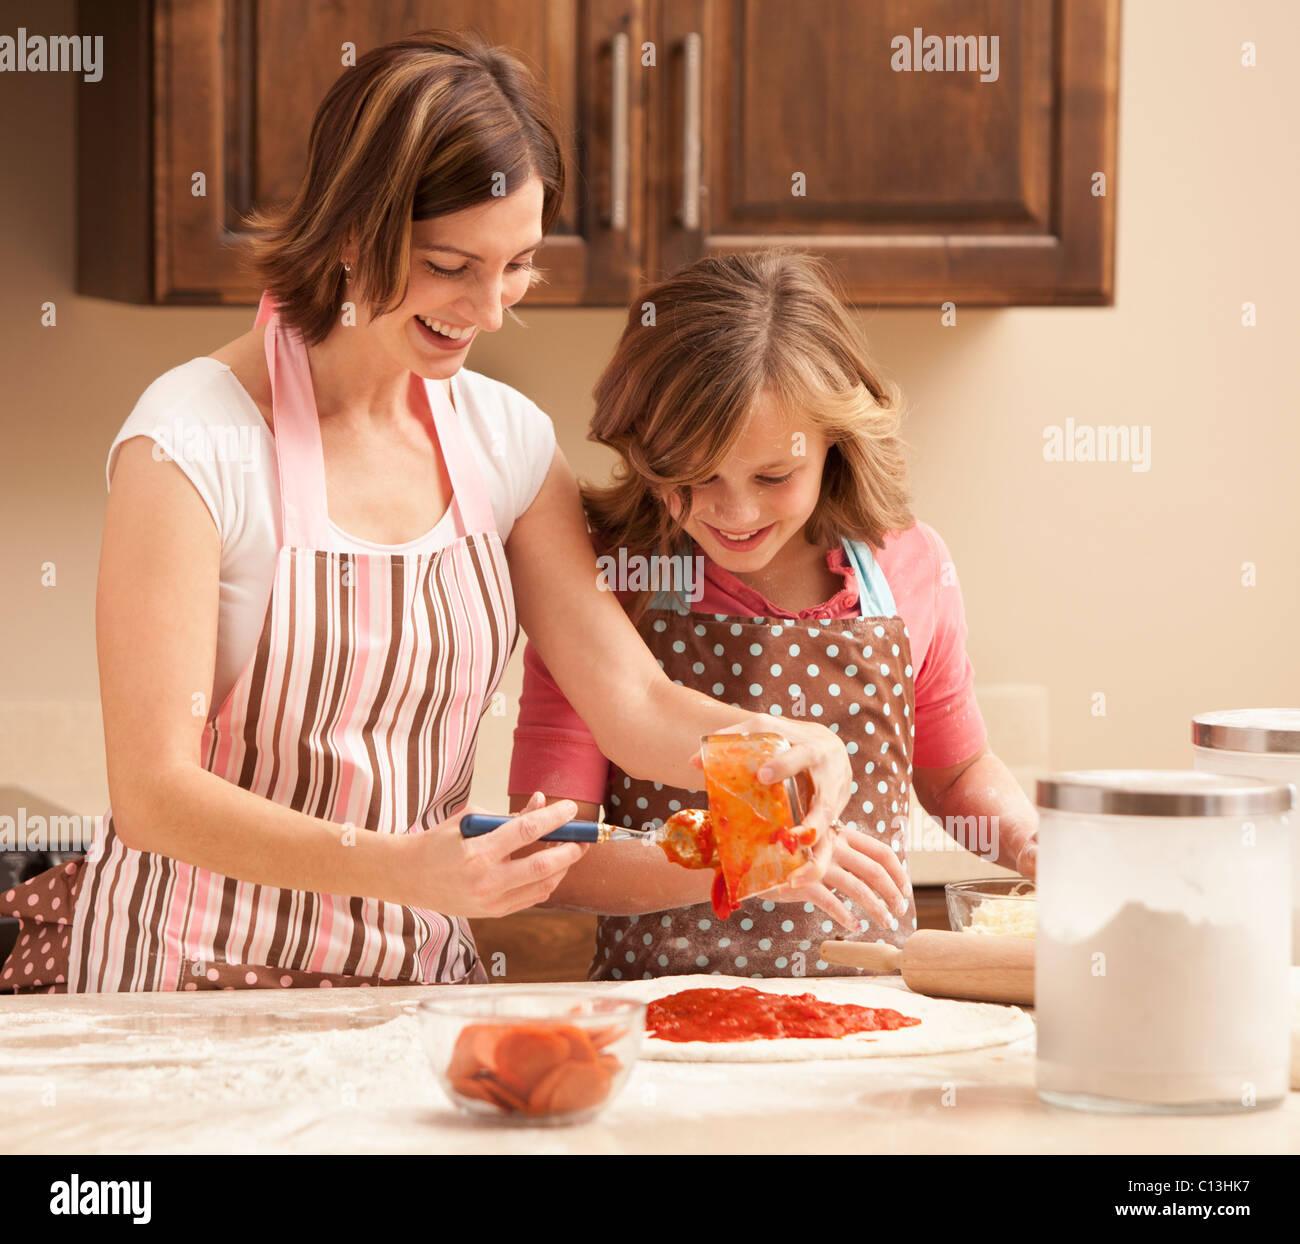 USA, Utah, Lehi, Mother and daughter (10-11) preparing pizza in kitchen - Stock Image